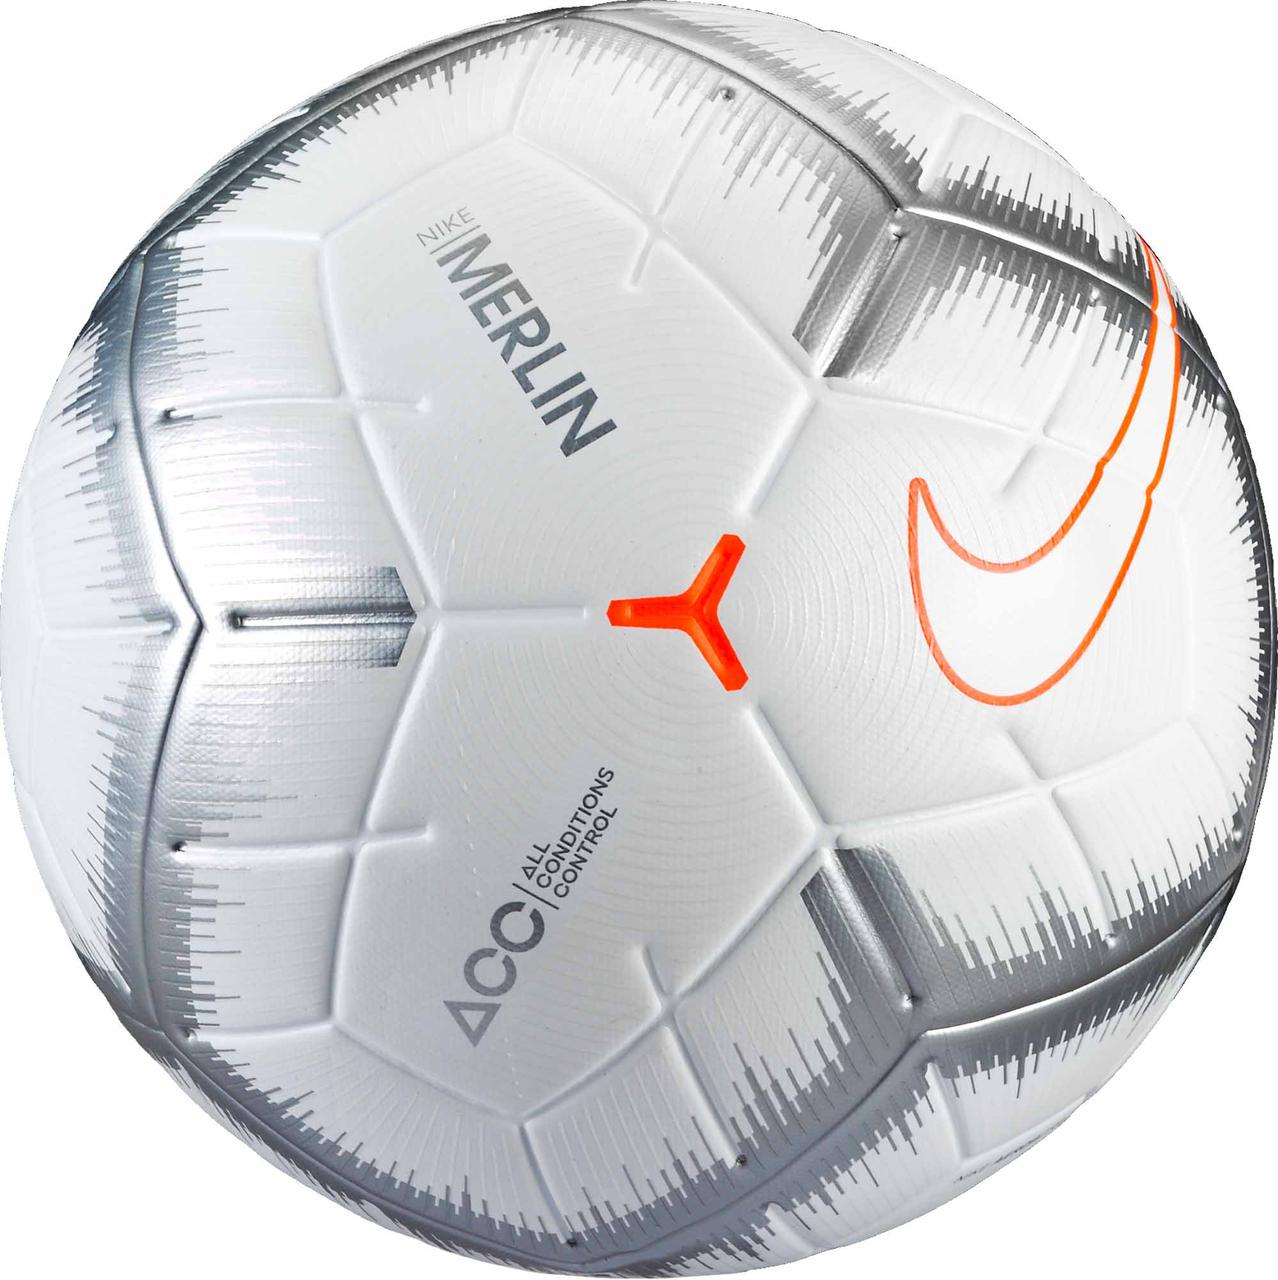 c4c43861 Мяч Nike Merlin Quickstrike SC3493-100 (Оригинал) - Football Mall - футбольный  интернет